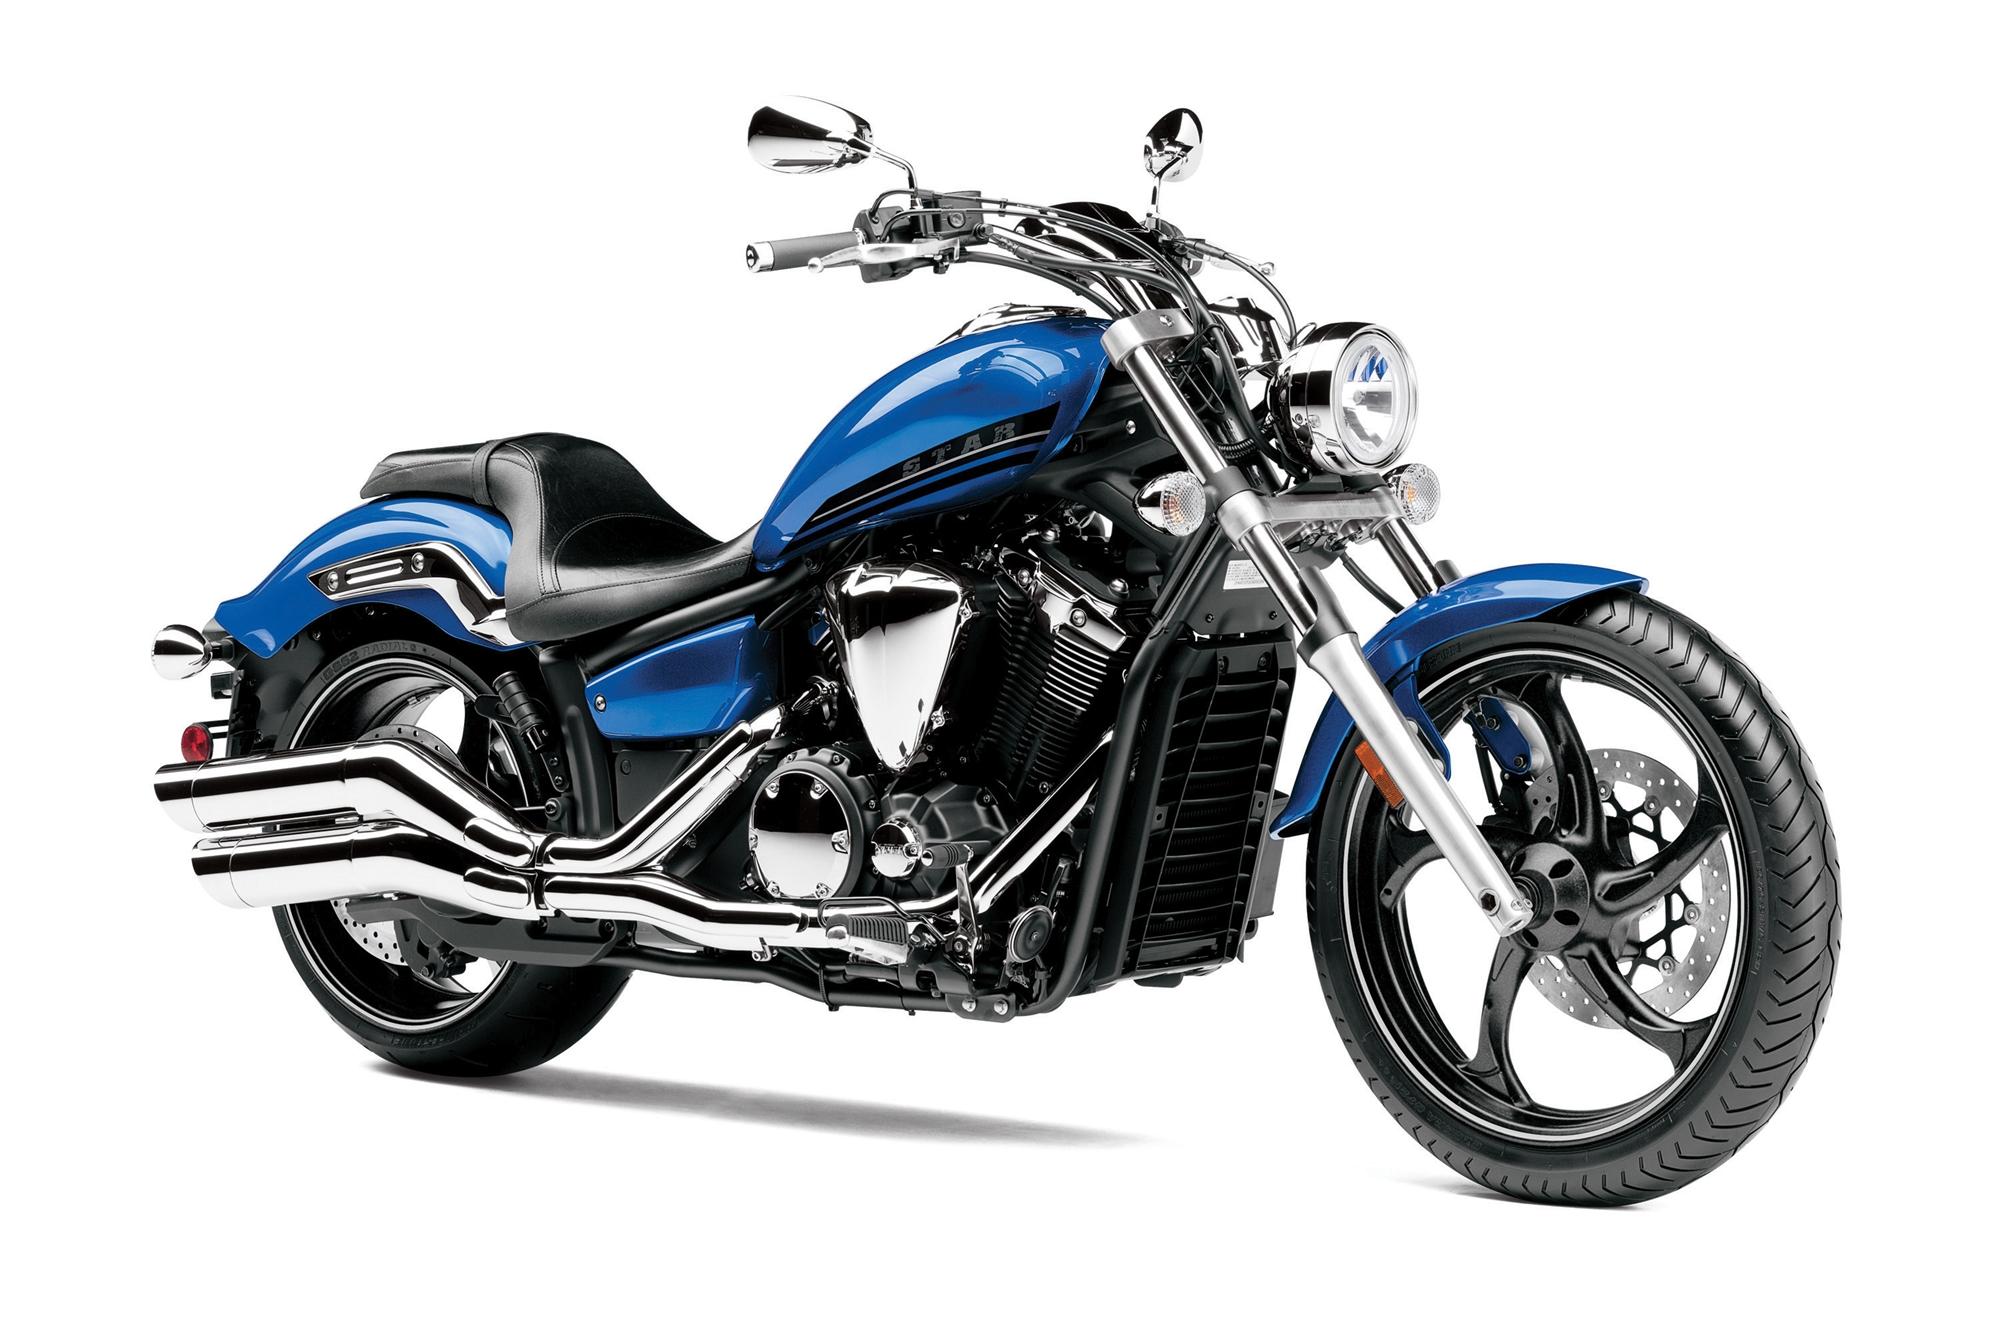 Yamaha stryker 2013 2014 autoevolution for 2017 yamaha stryker review